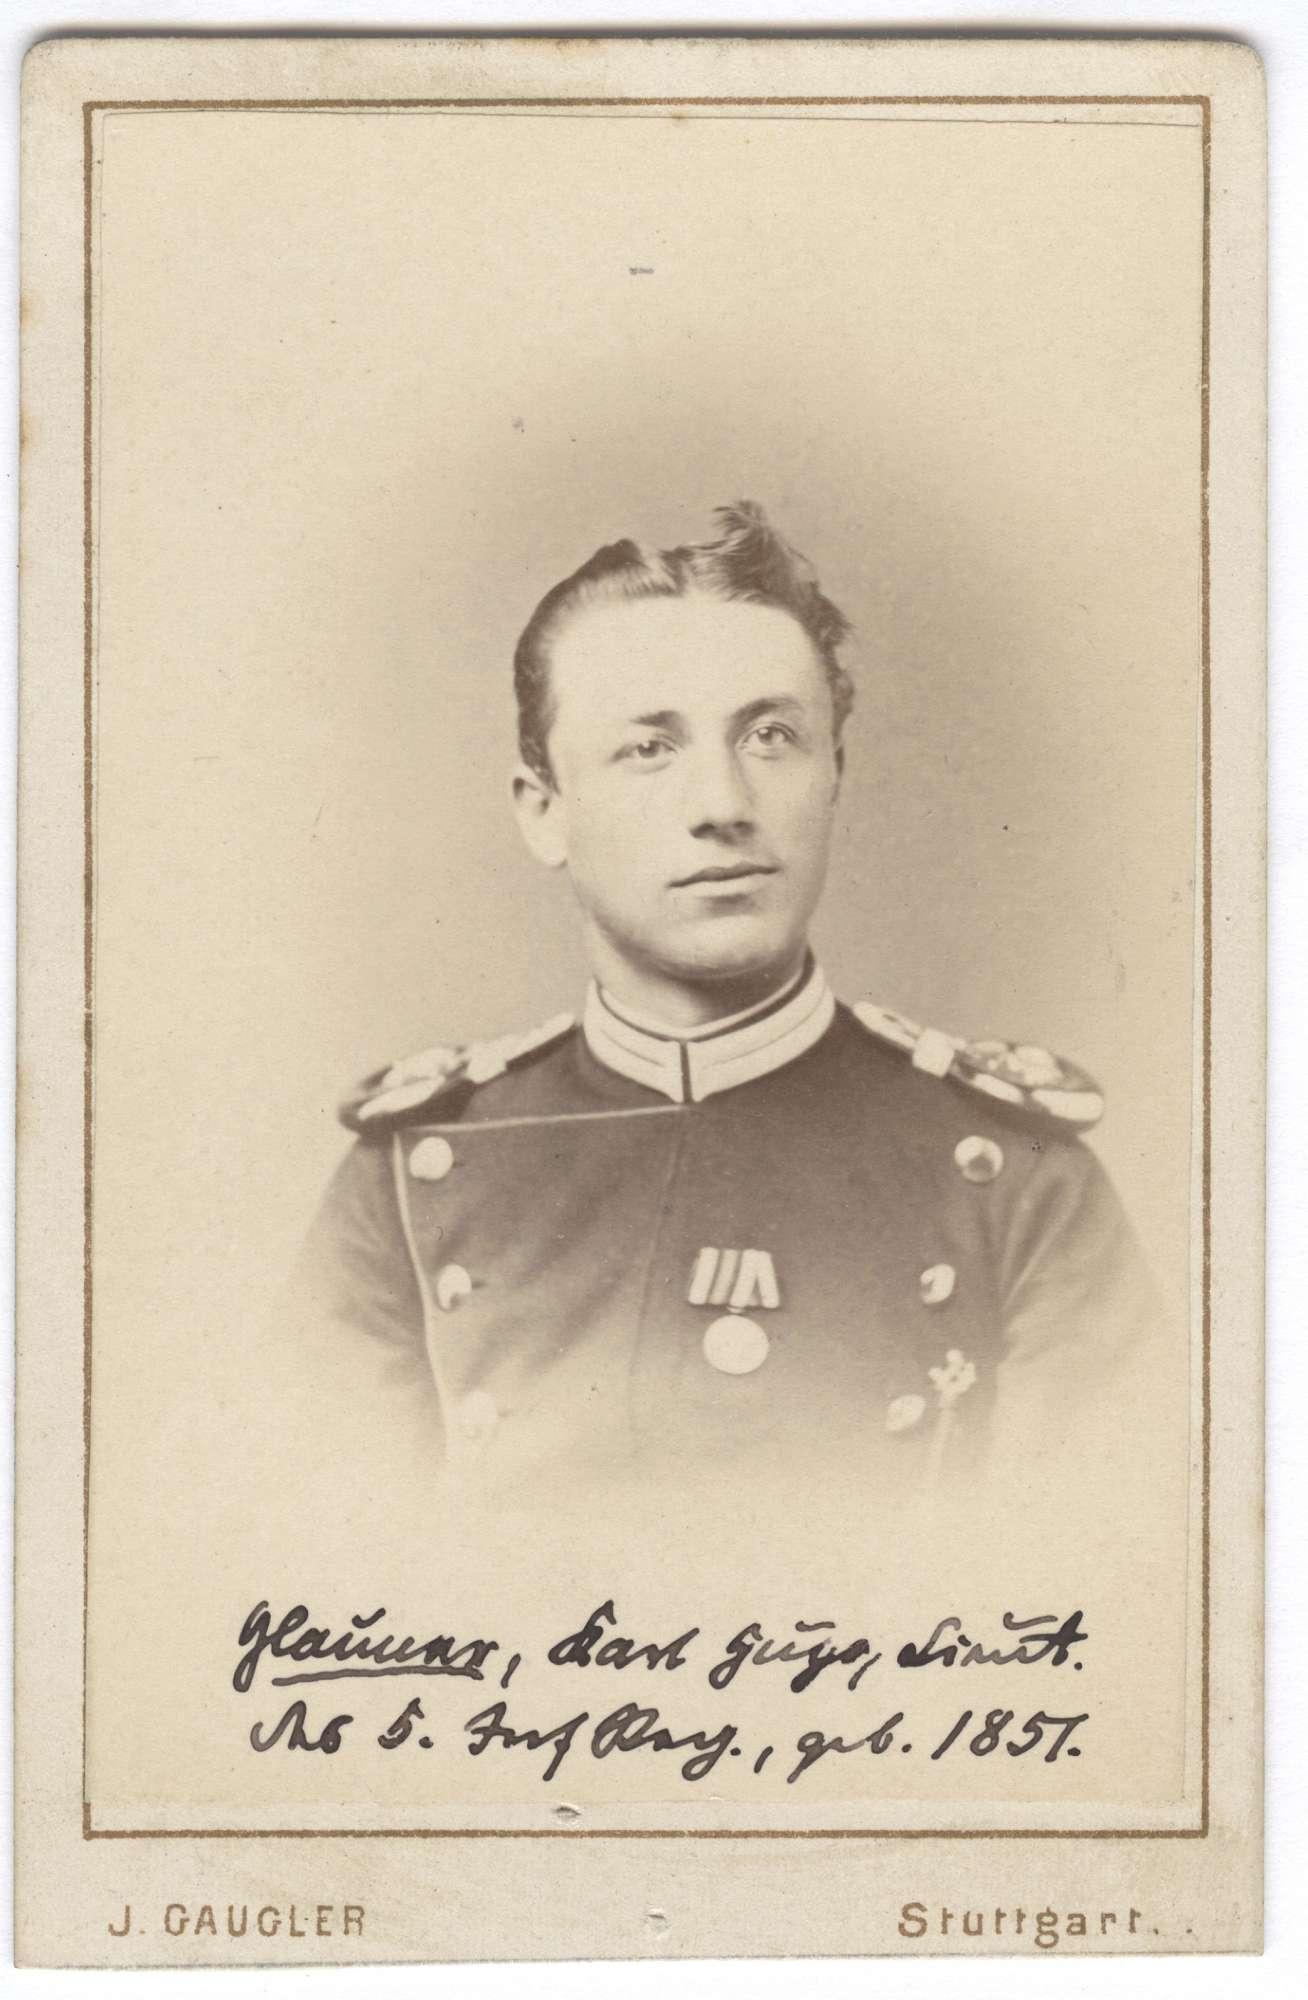 Glanner, Karl Hugo, Bild 1